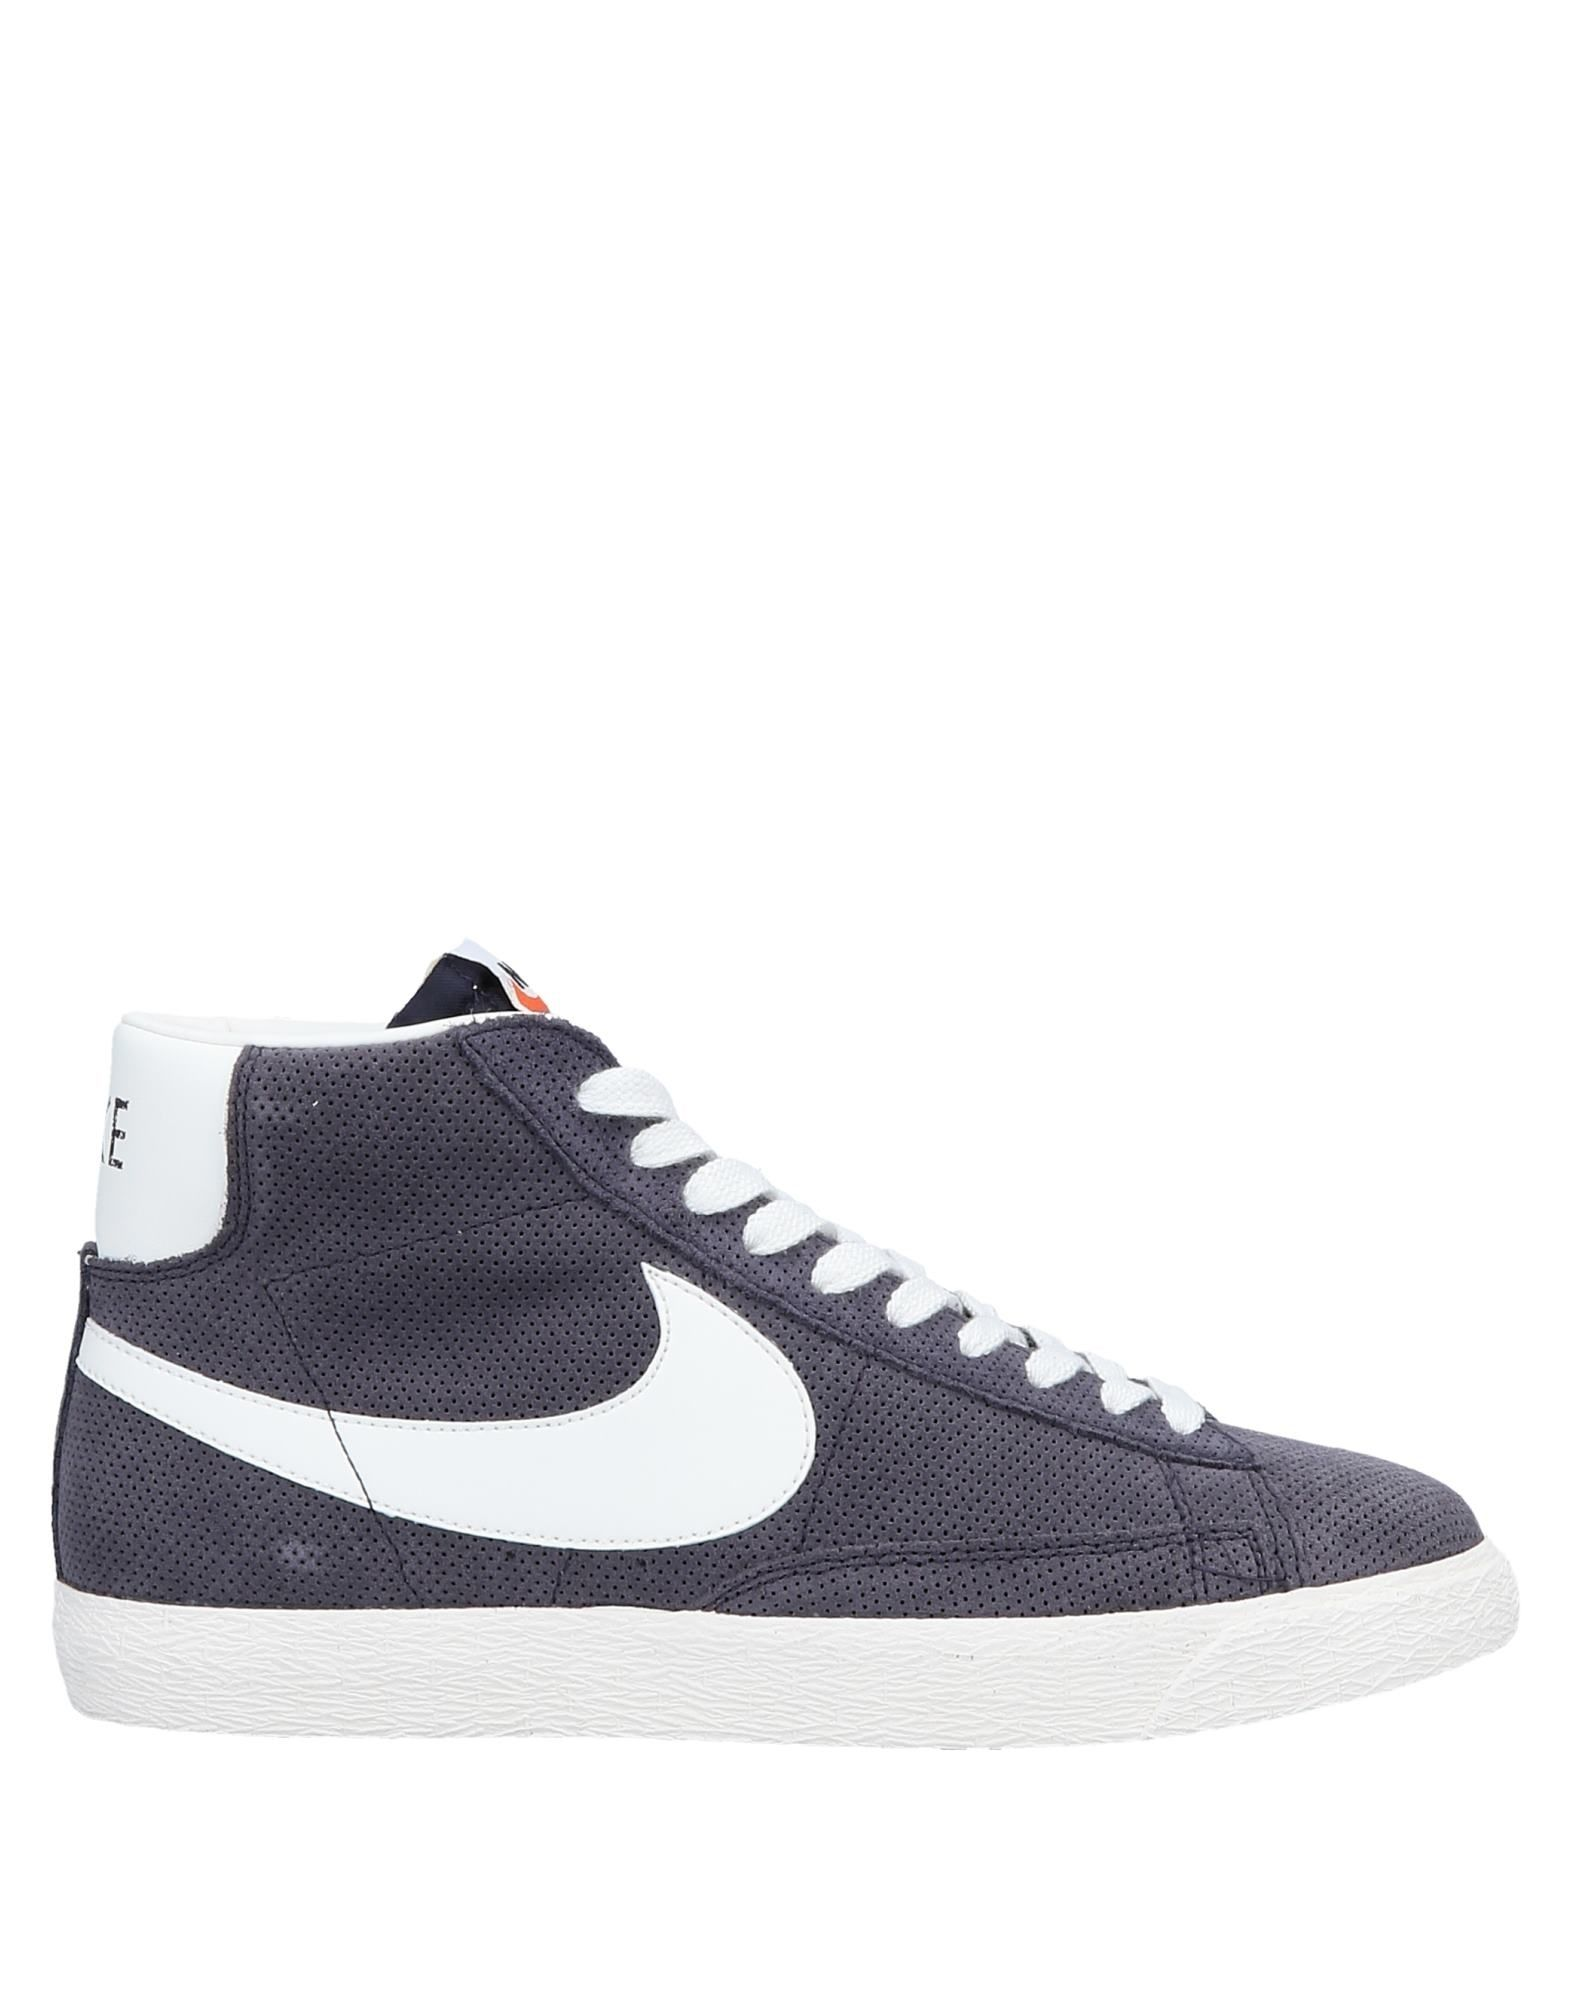 Rabatt echte Schuhe Nike Sneakers Herren  11572897DV